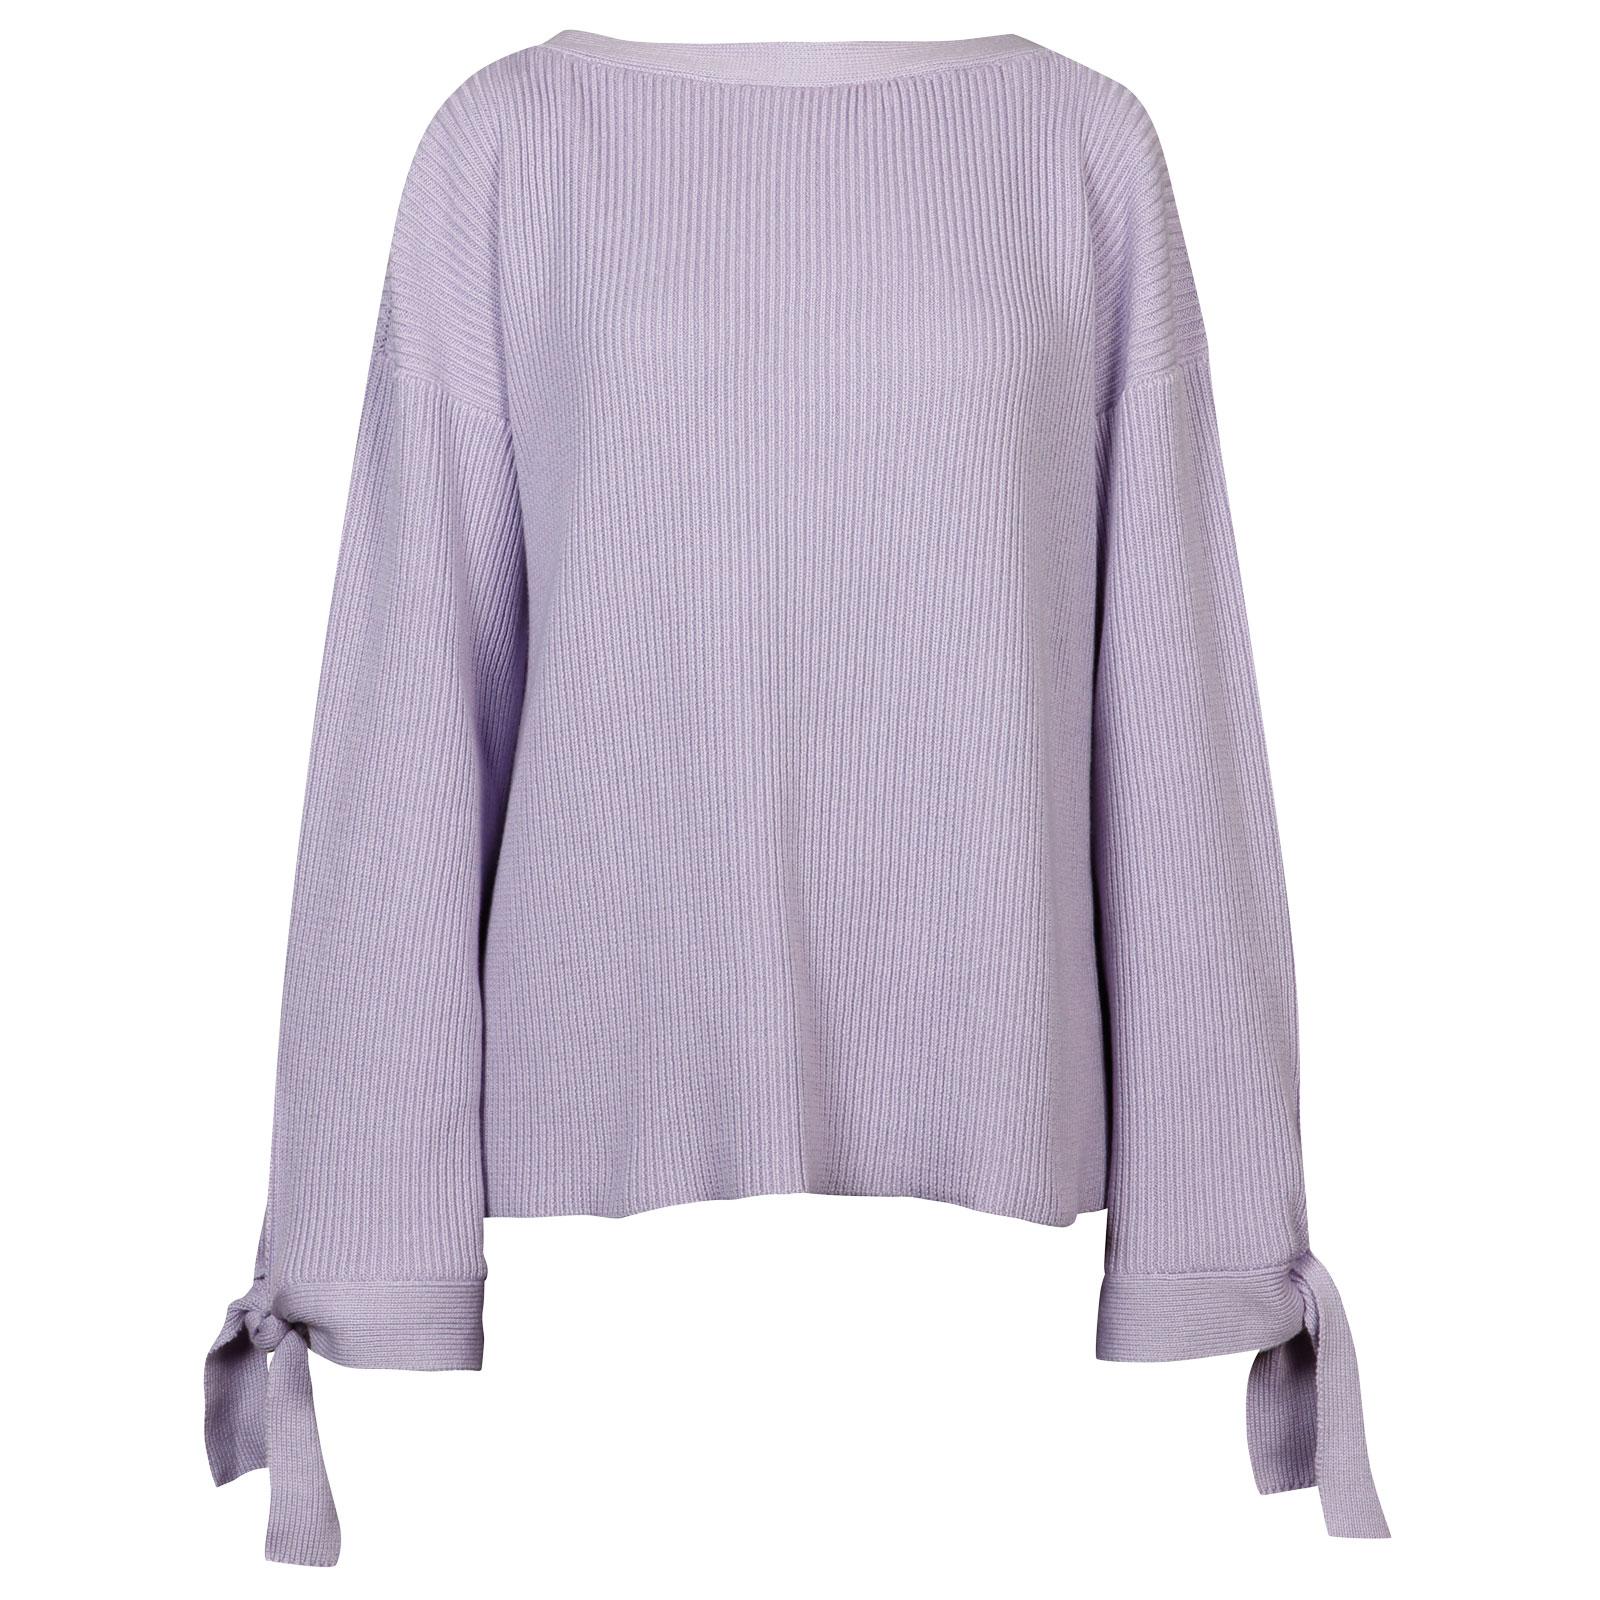 John Smedley Risby Merino Wool Sweater in Pintuck Lilac-XL